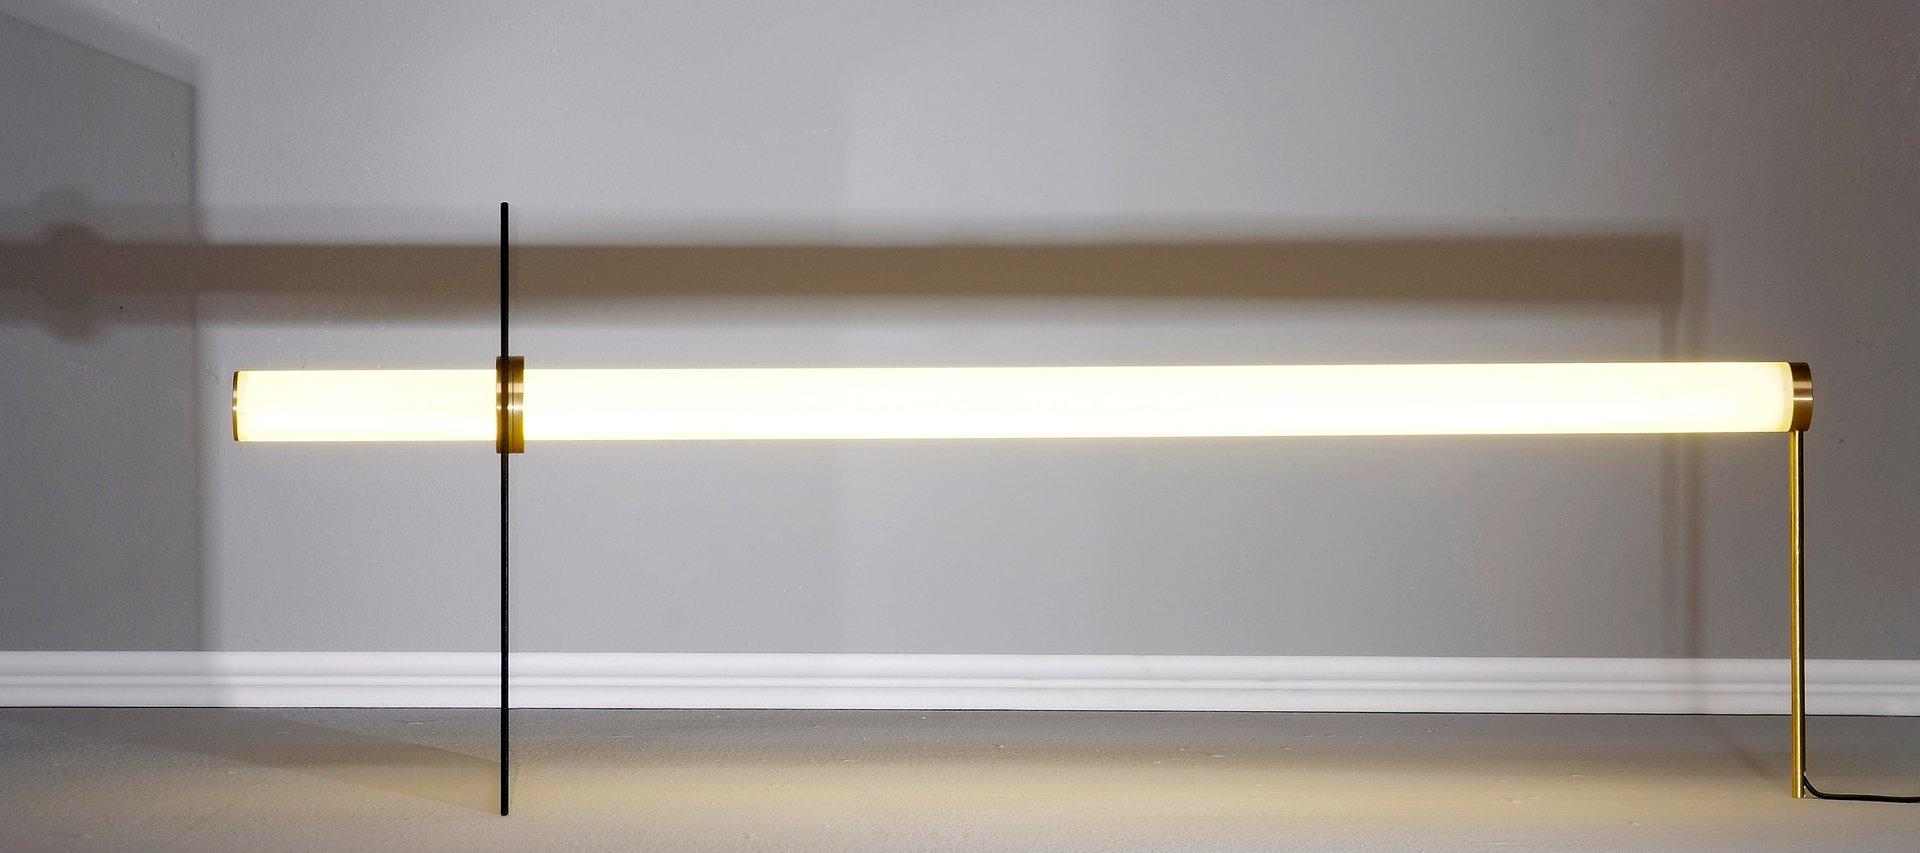 005/2 Lampe von Naama Hofman